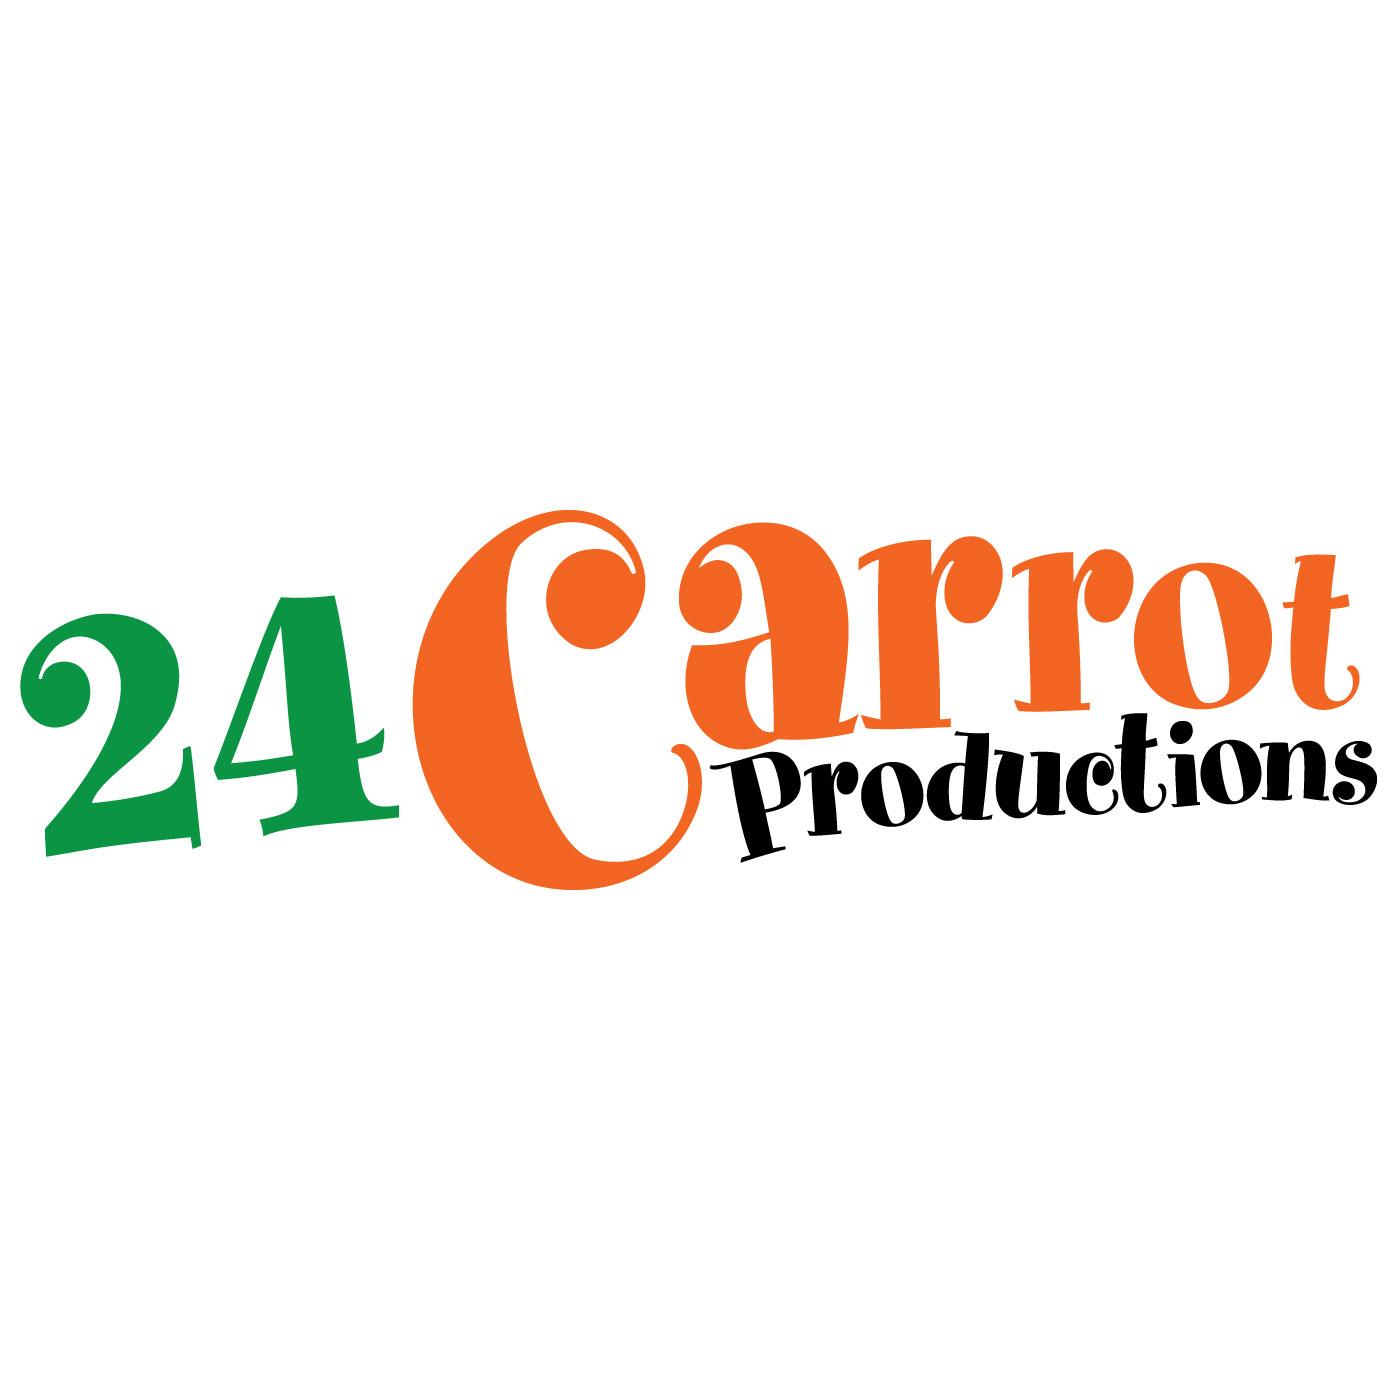 24CarrotProductions.jpg